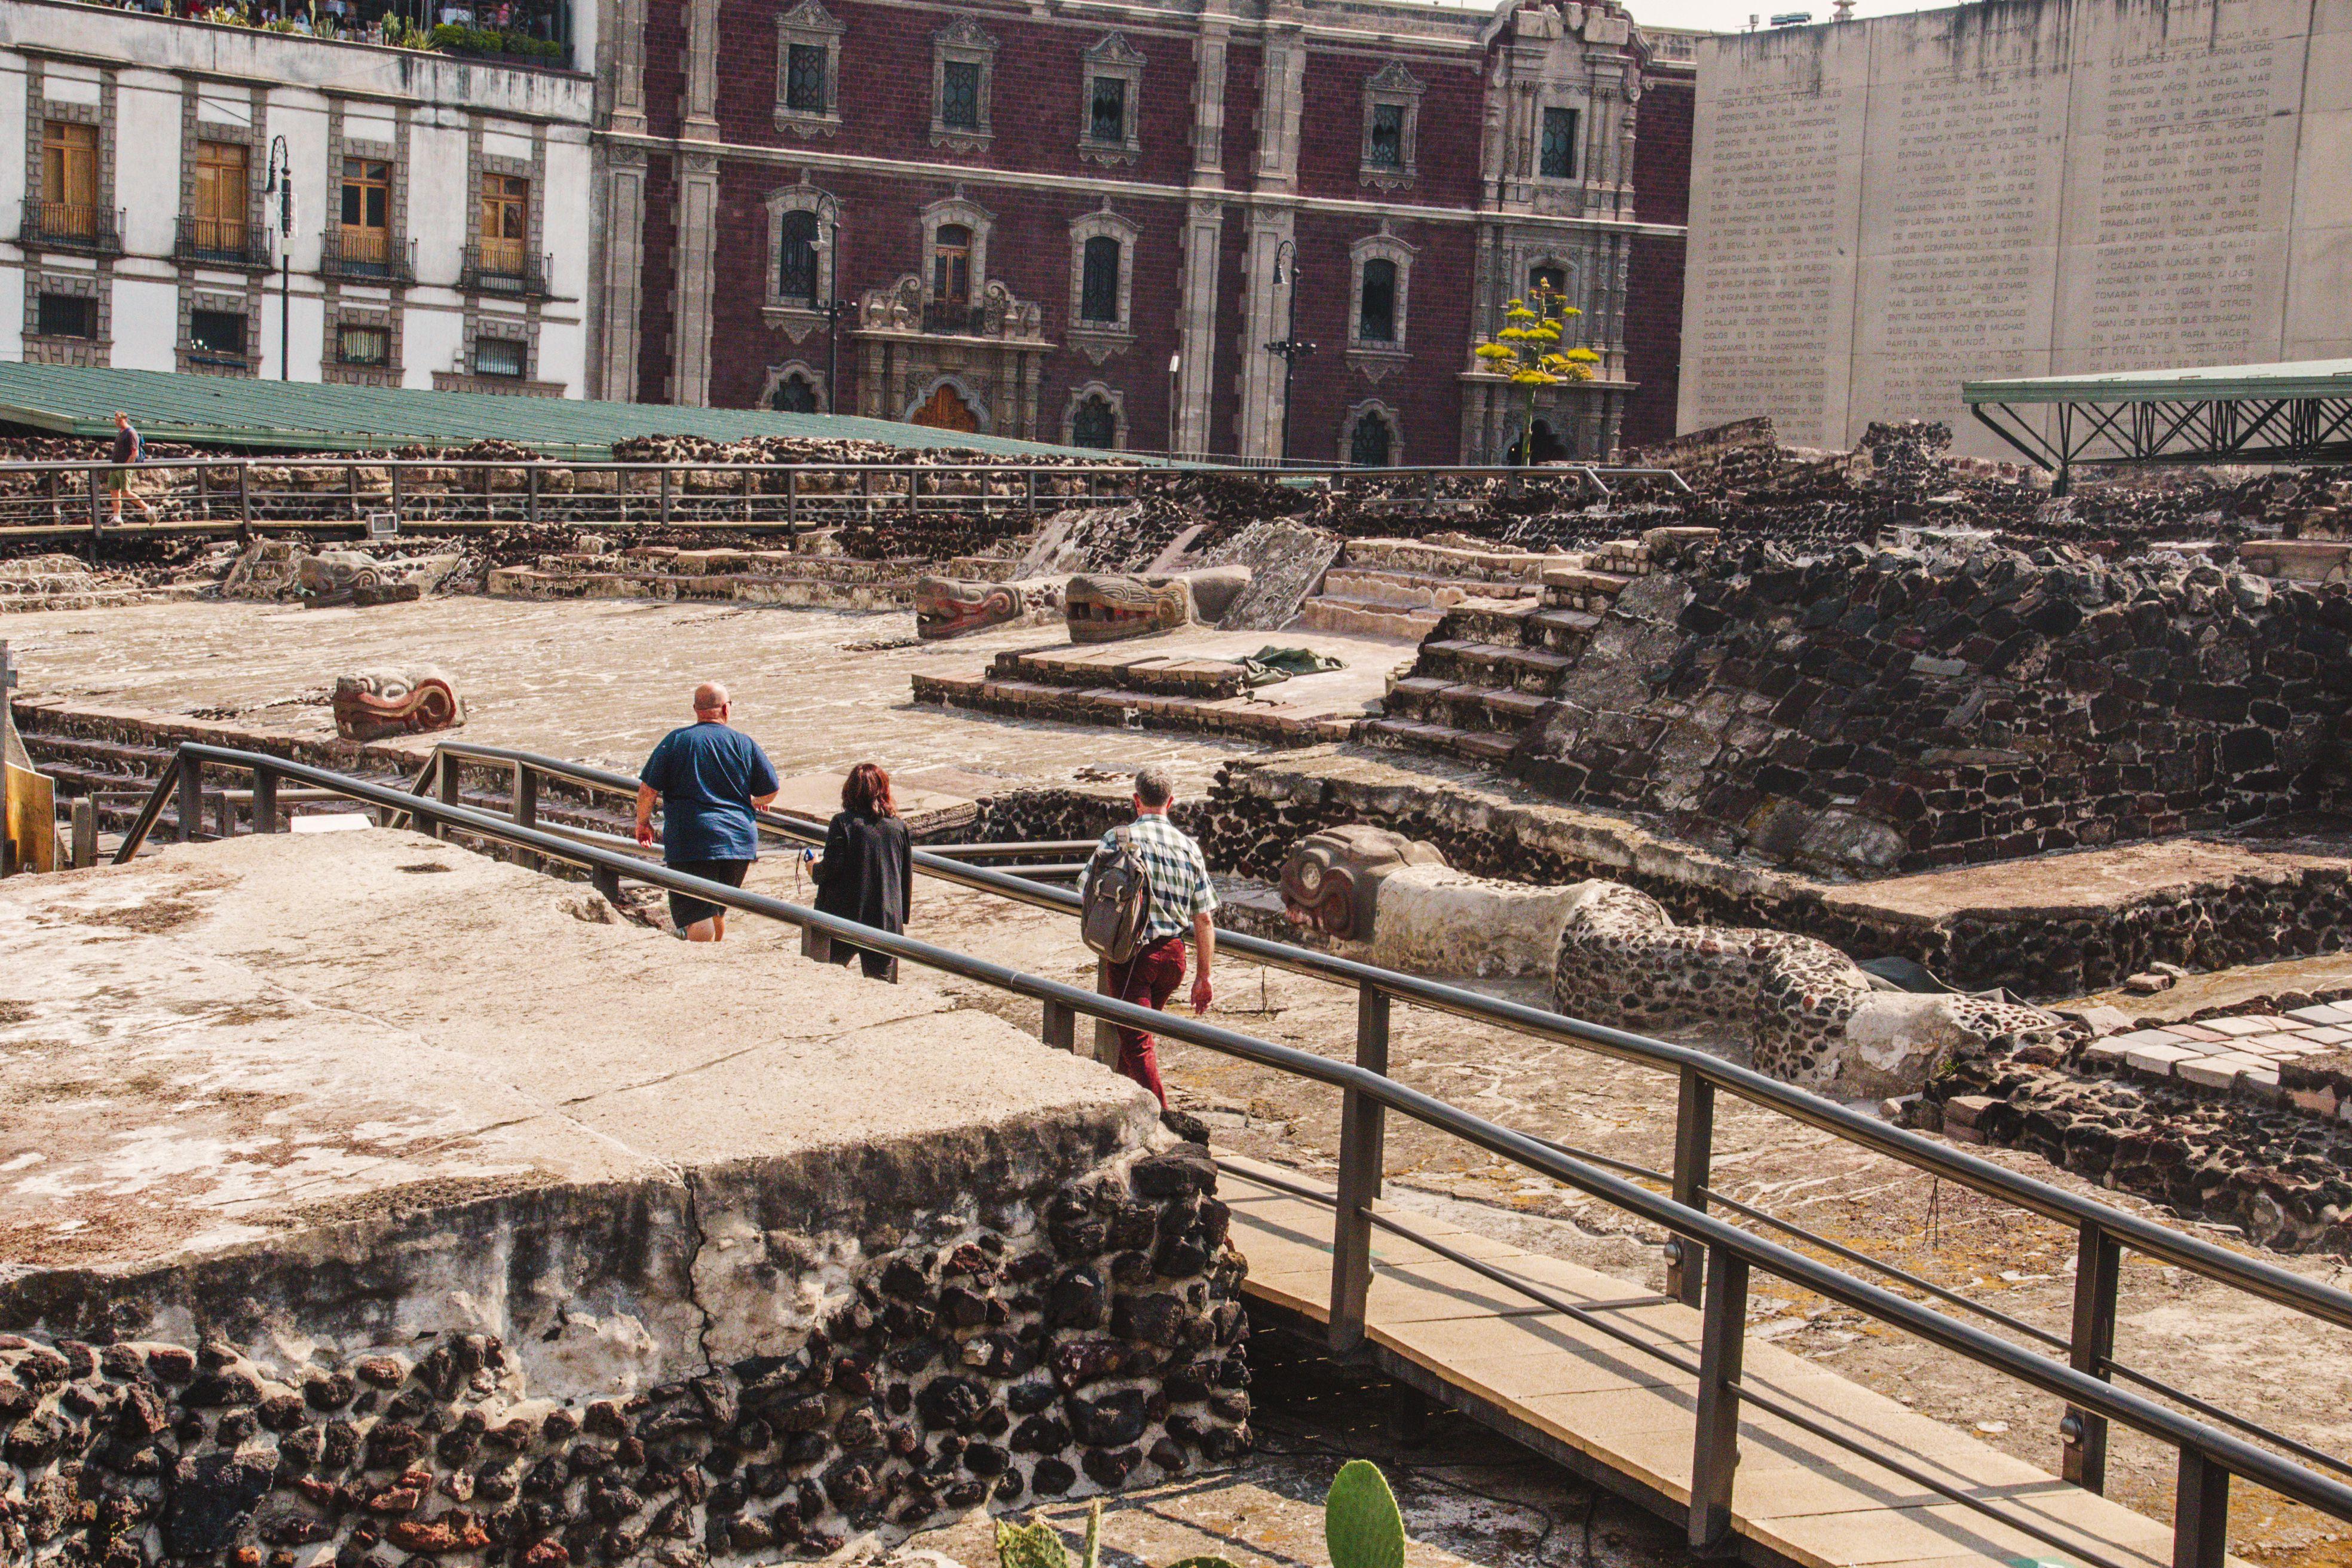 Templo Mayor with three people walking on a bridge